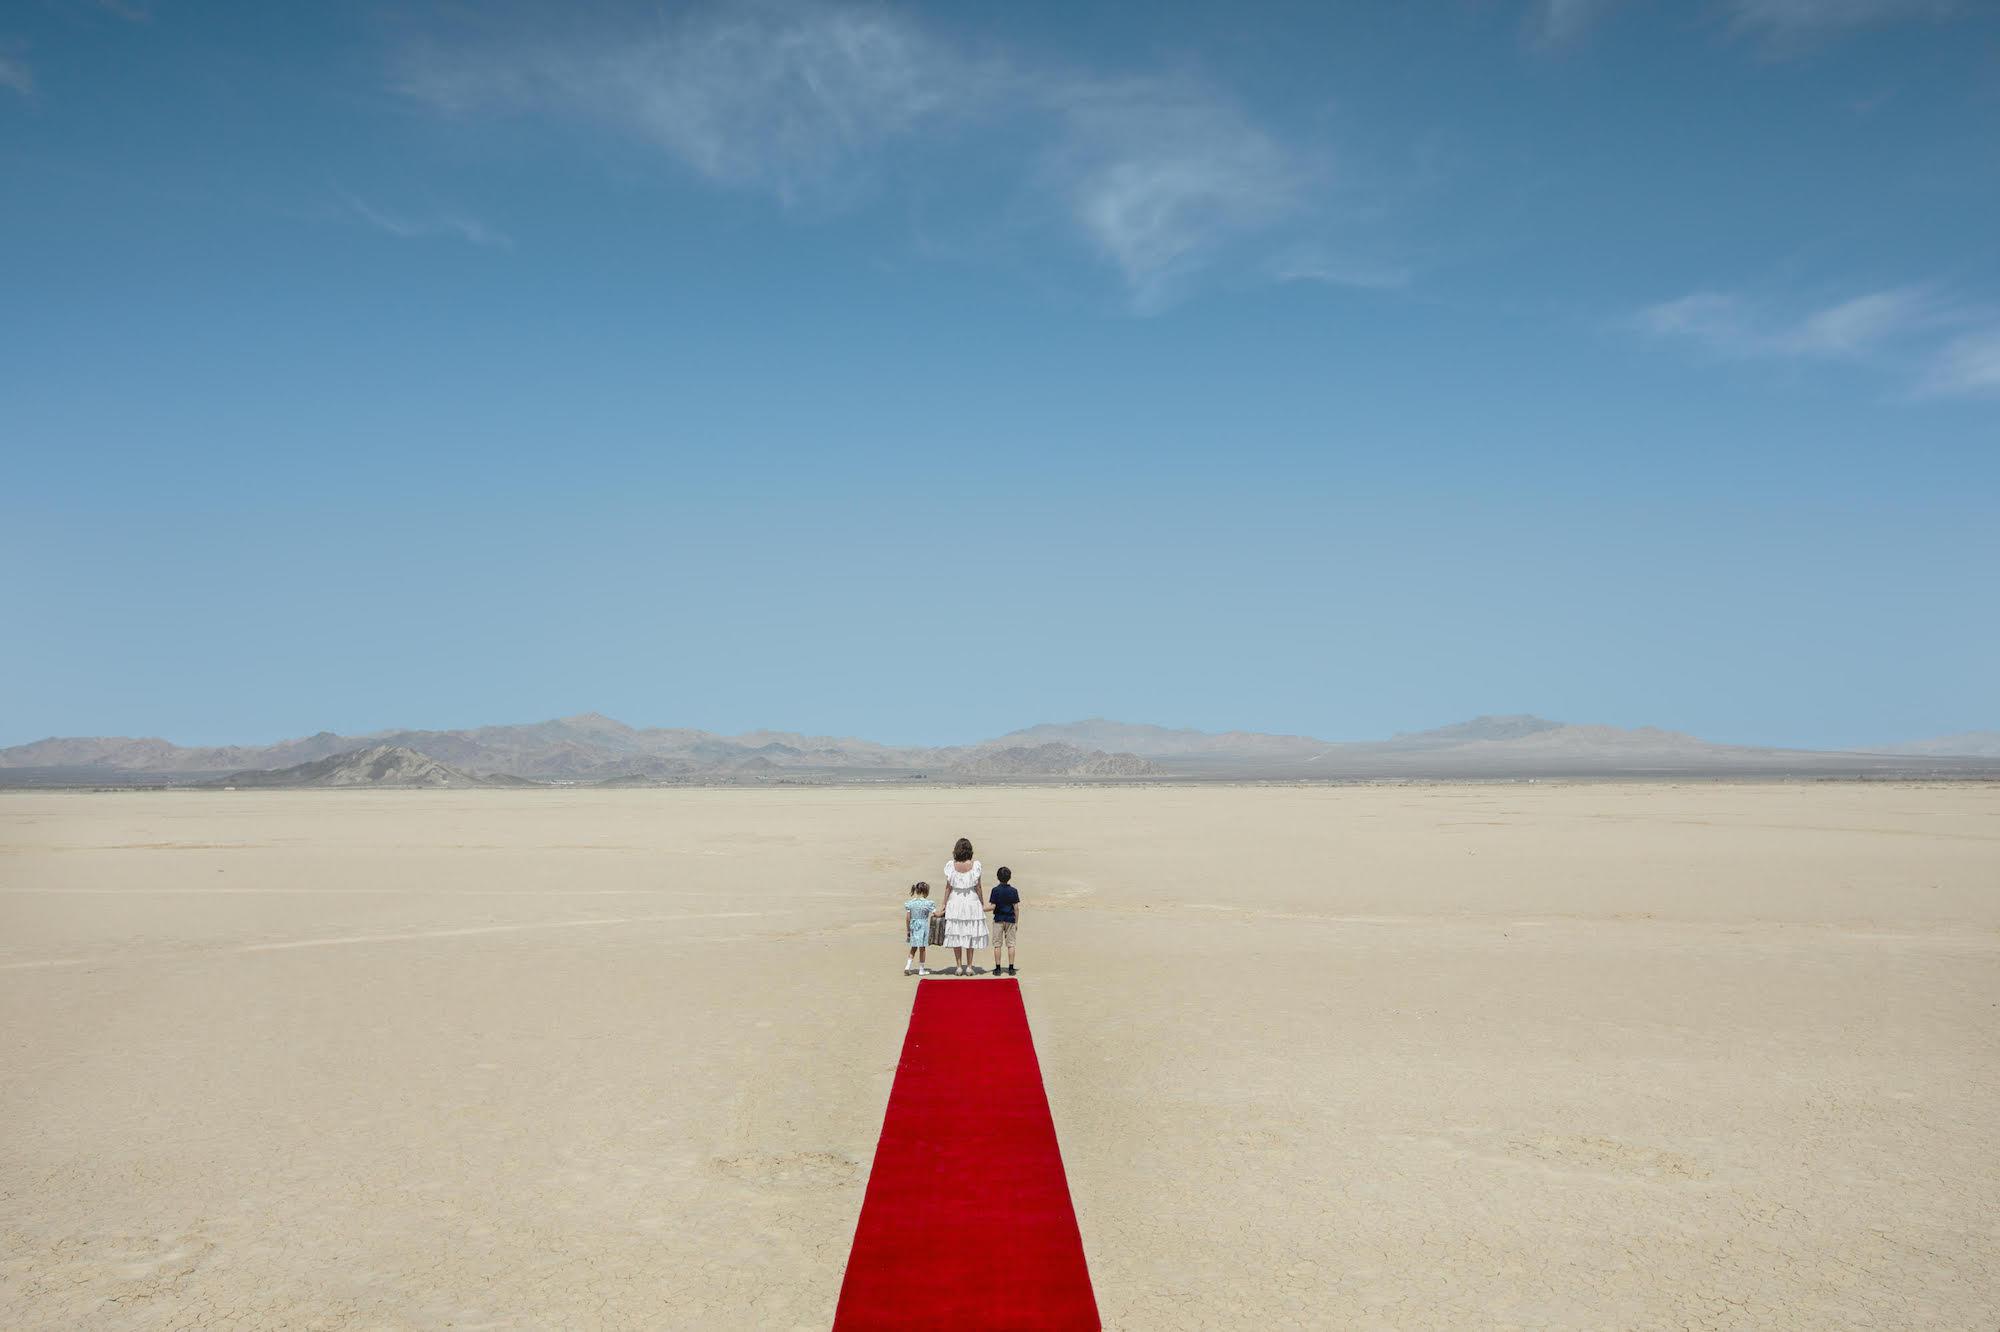 The Arrival, 2019, from Santa Barbara (Aperture, 2020) © Diana Markosian